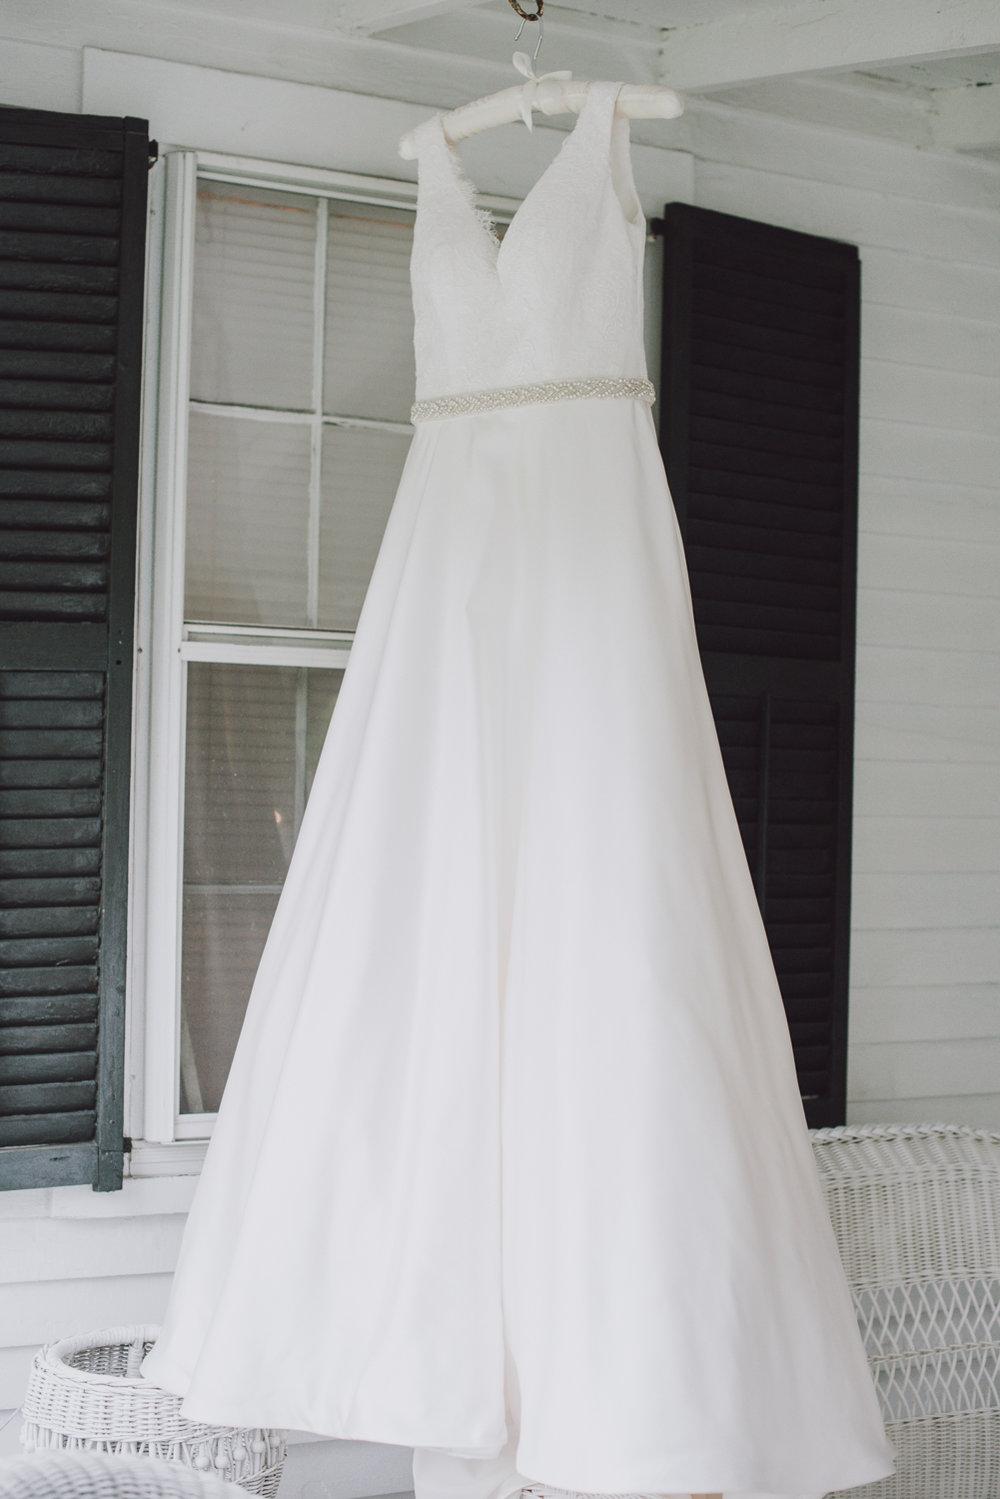 maureen_evan_wedding_dress_marthas_vineyard-8112.jpg